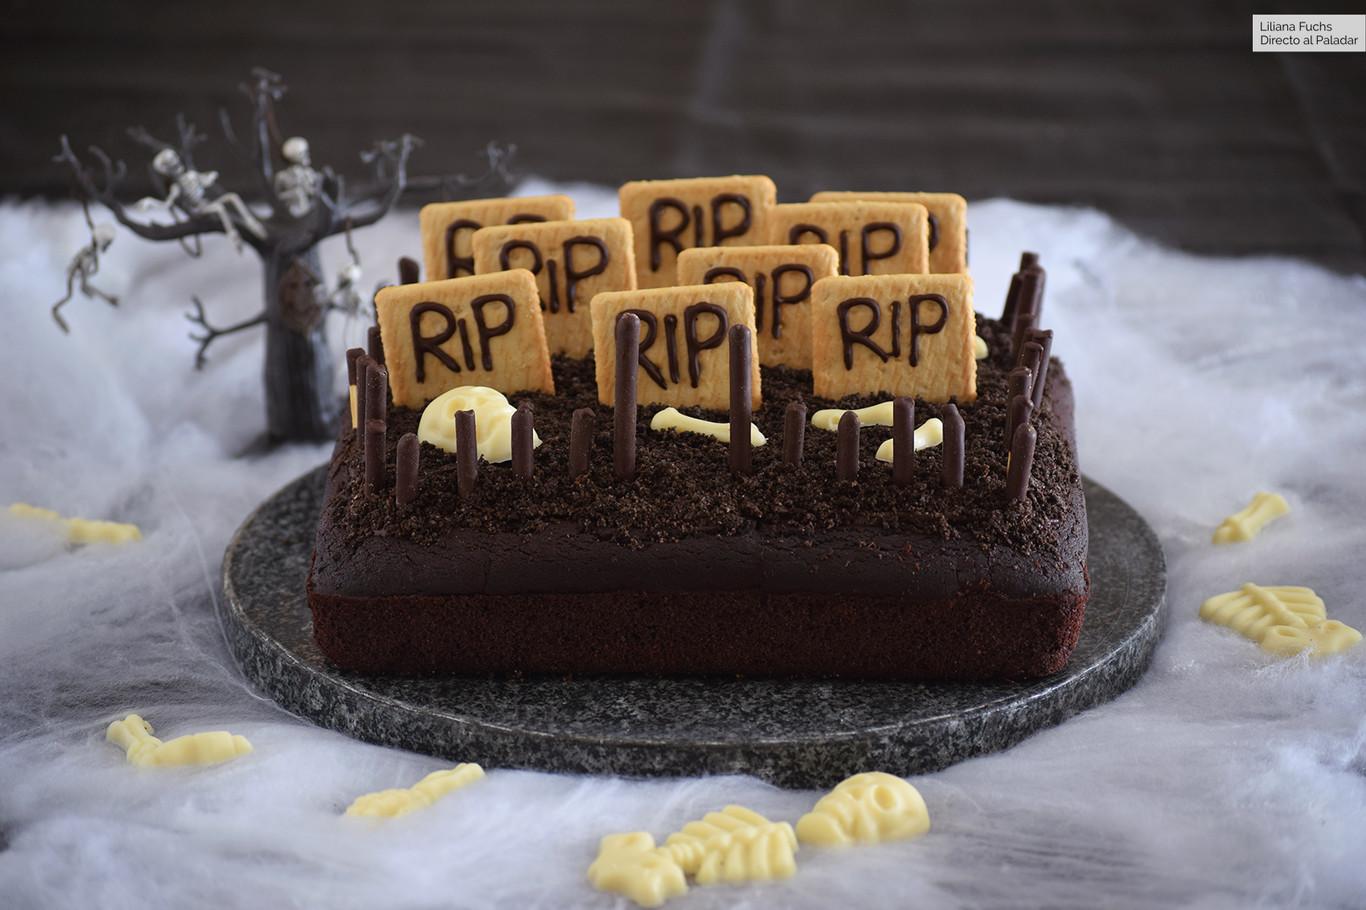 Tarta cementerio de chocolate: receta muy fácil para compartir en Halloween